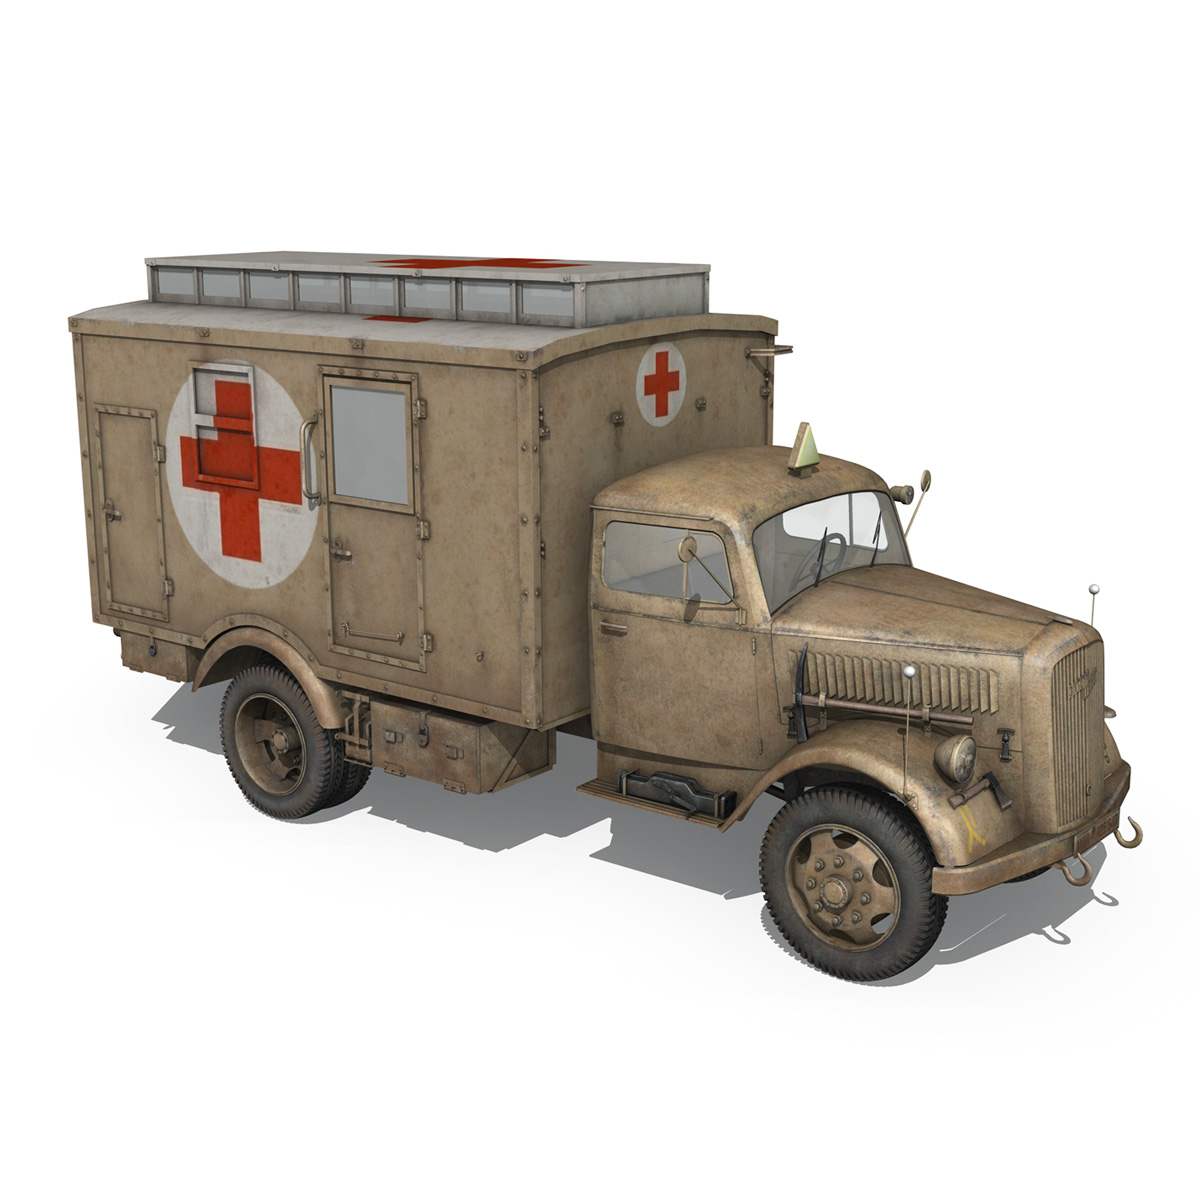 opel blitz – 3t ambulance truck – 2 pzdiv 3d model 3ds c4d fbx lwo lw lws obj 265759